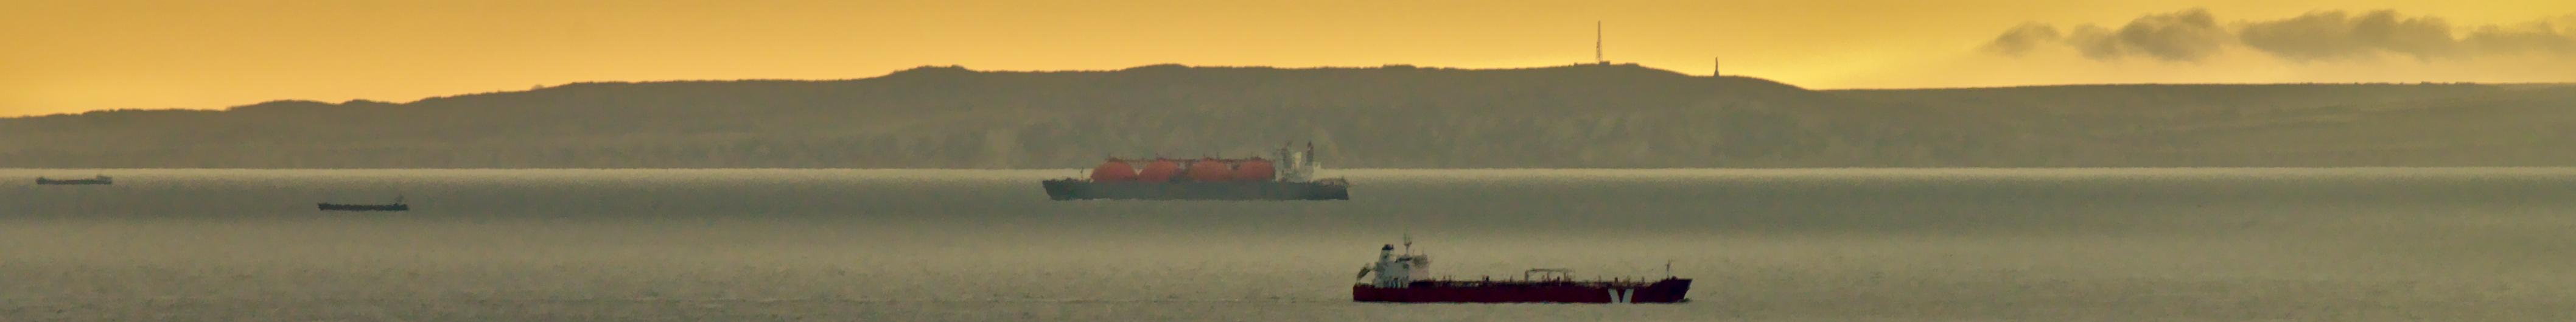 cap-petit-blanc-shipping-lanes-seperation-zone.jpg